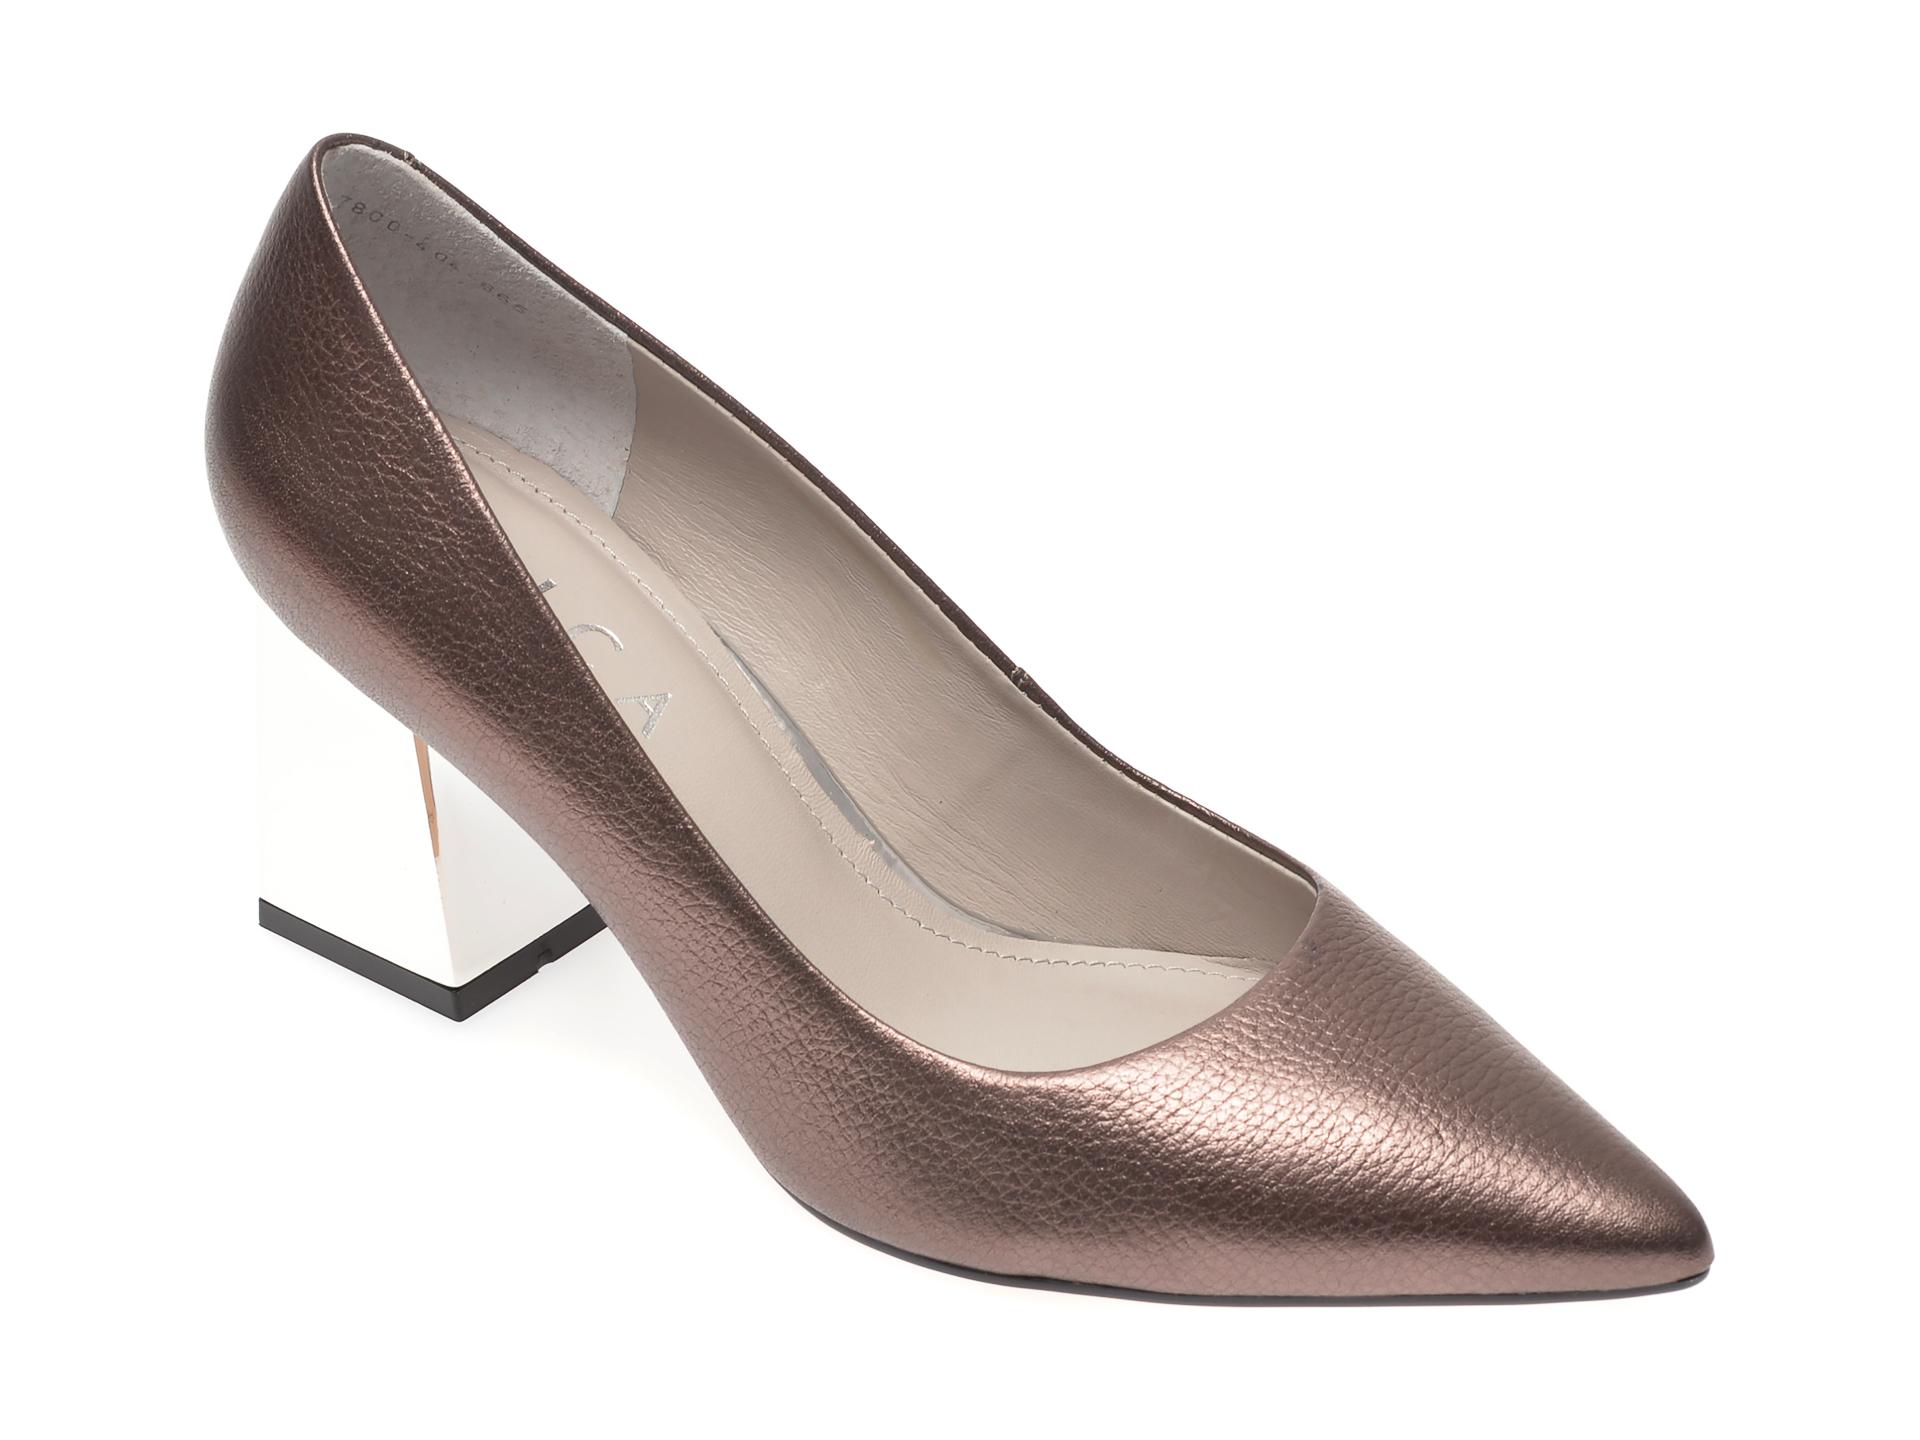 Pantofi EPICA aurii, 7800404, din piele naturala